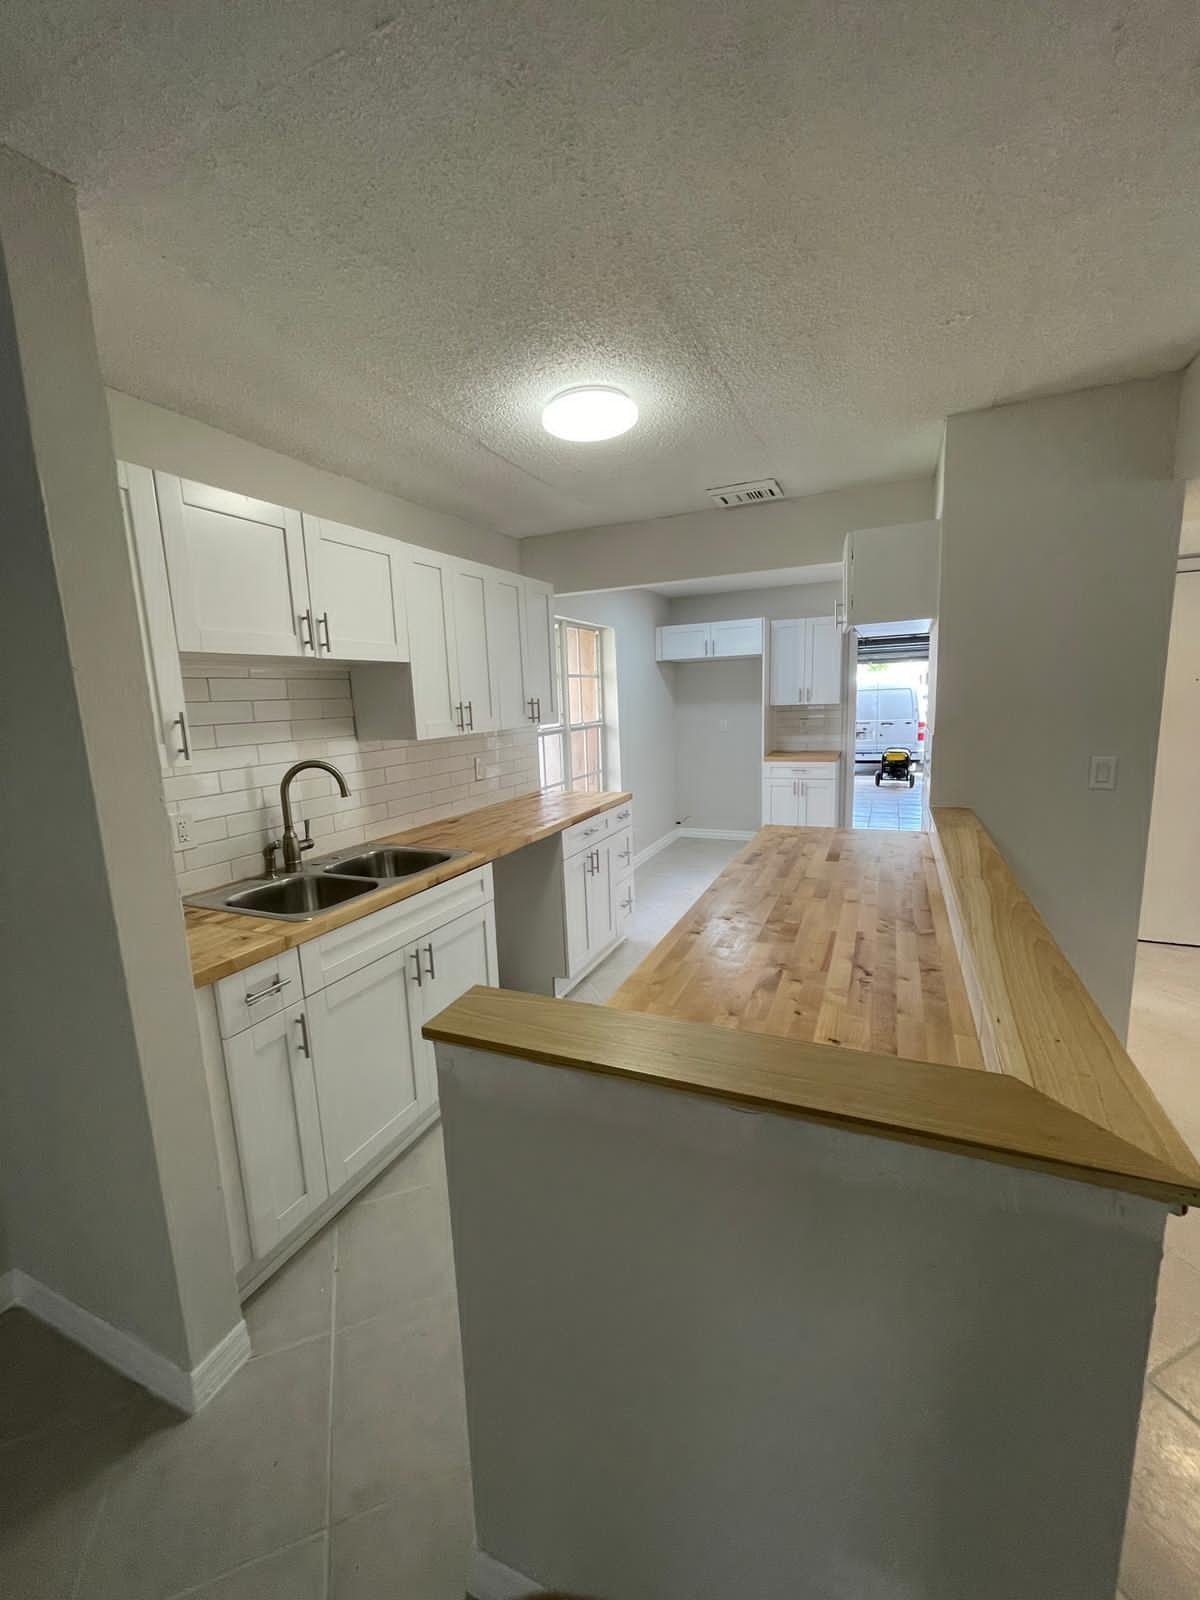 1763 NW 58th Avenue #8, Lauderhill, FL 33313 - MLS#: RX-10700698